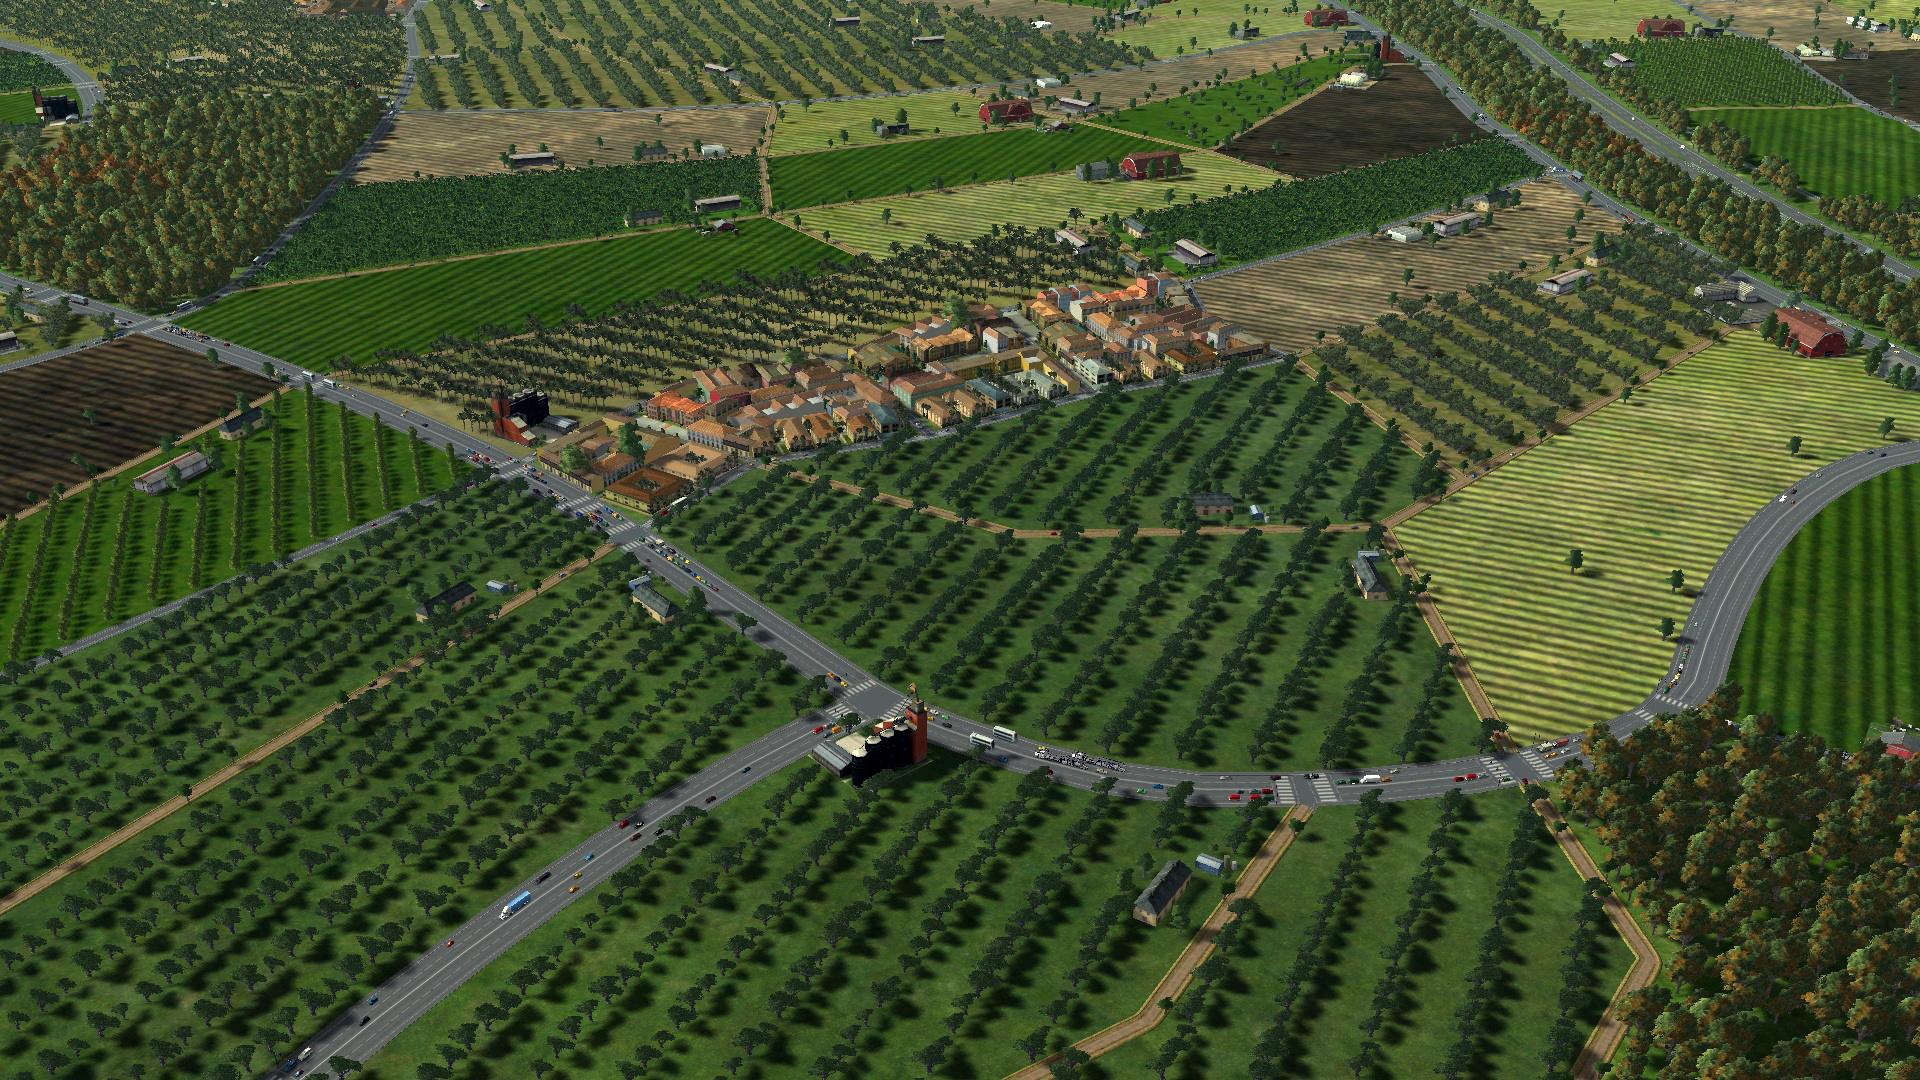 cxl_screenshot_cuva cavelio_Rural_13.jpg